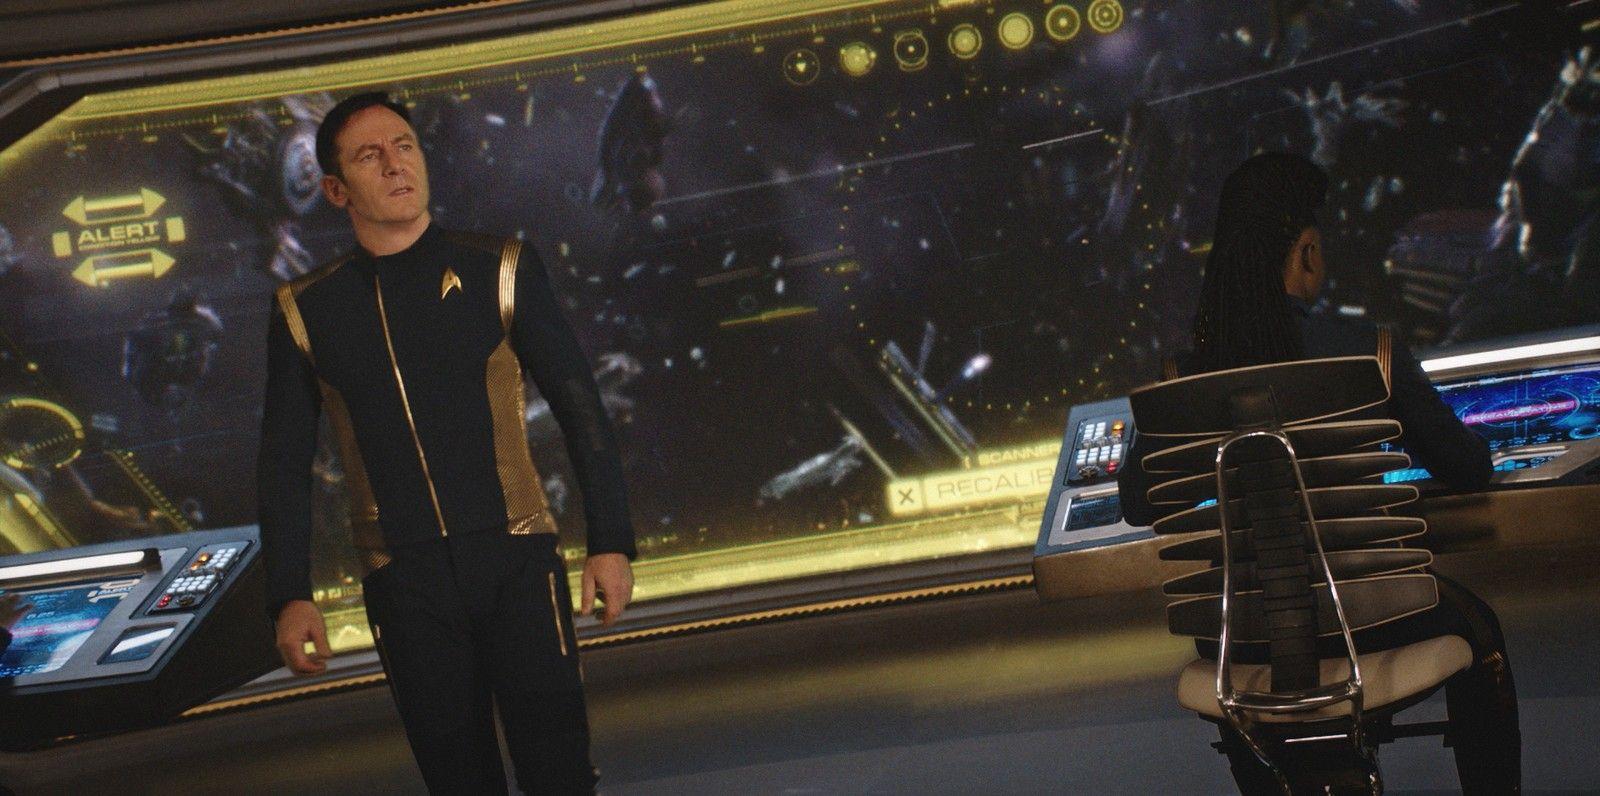 """Star Trek Discovery"" regresa hoy lunes a Netflix con nuevos episodios"